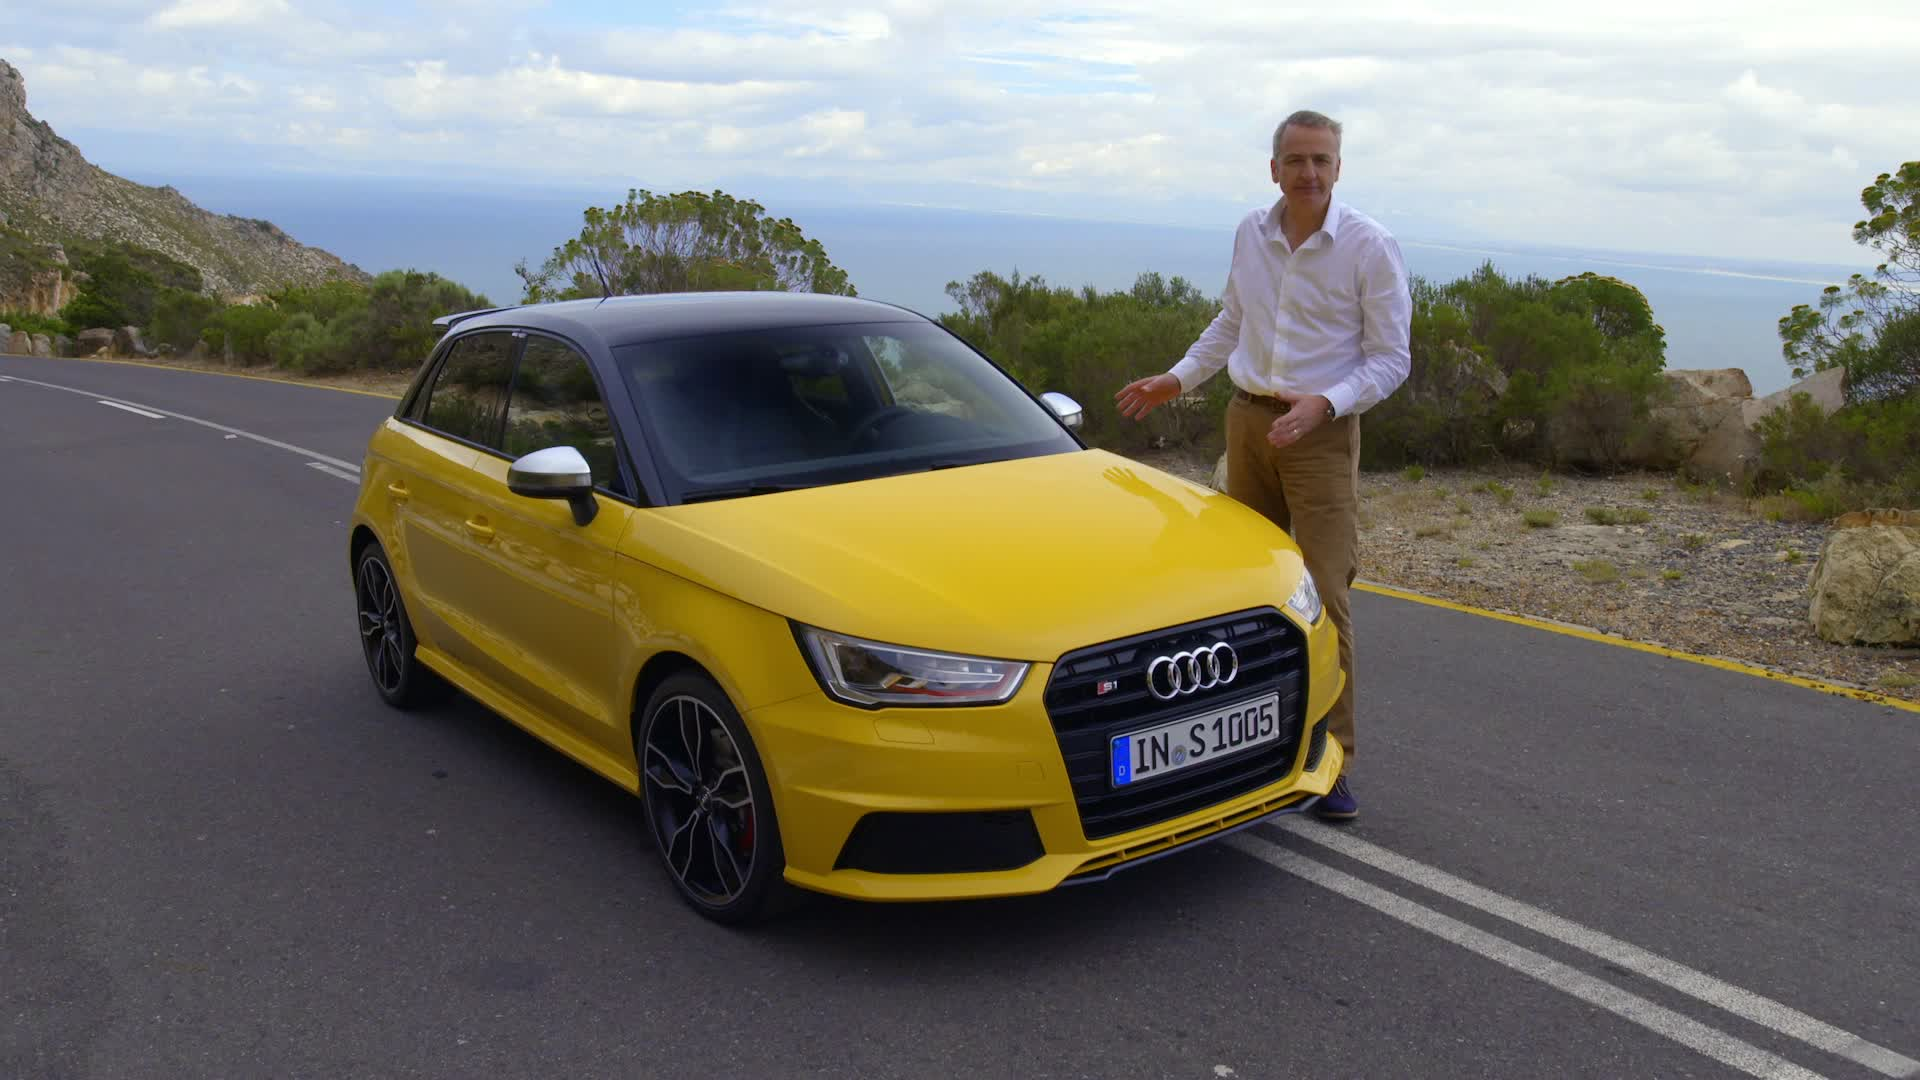 Audi S1 Sportback - Weltpremiere 2014